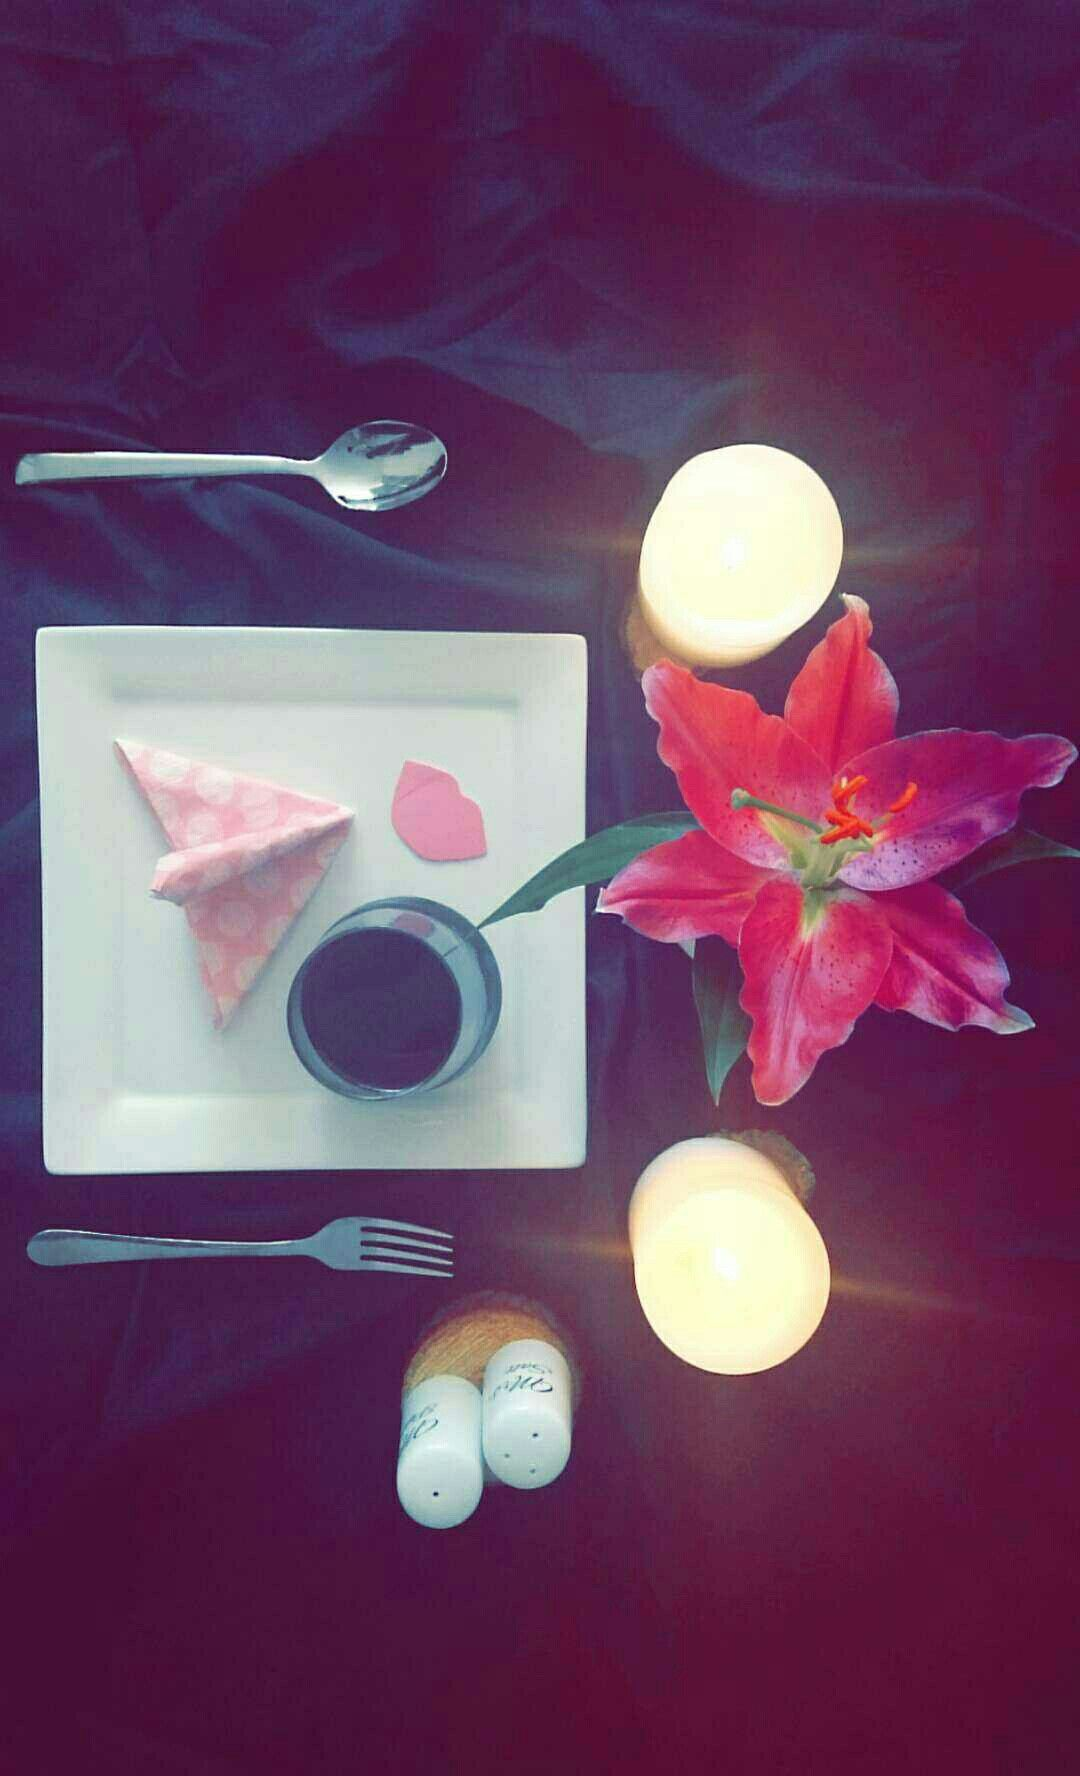 Simple dinner table